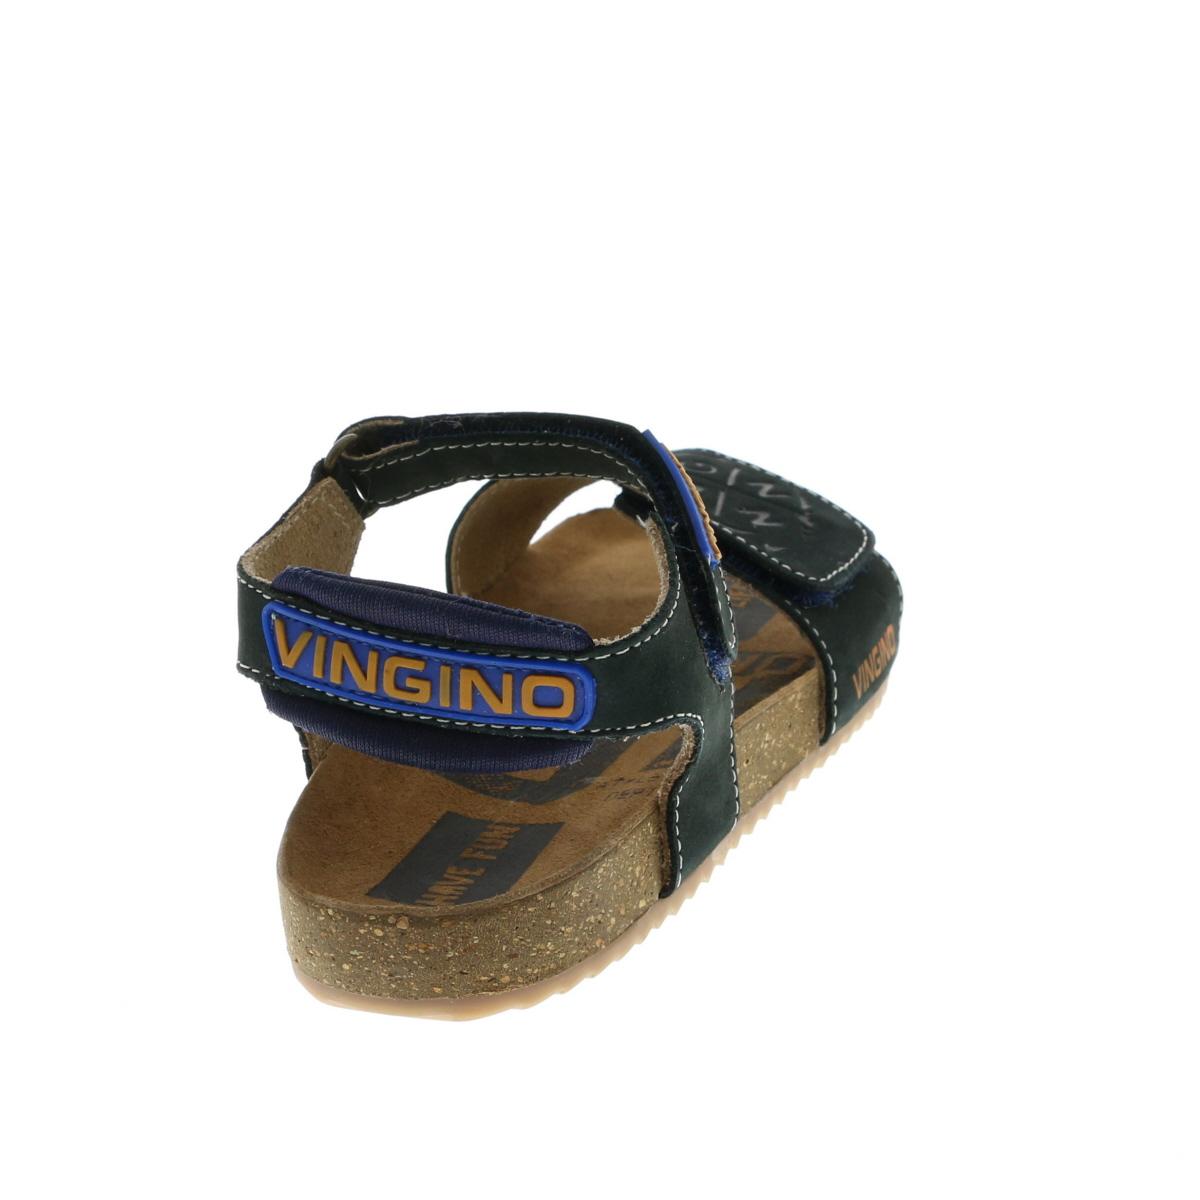 62a58d212d4780 Vingino shoes Sandalen blauw - kleertjes.com